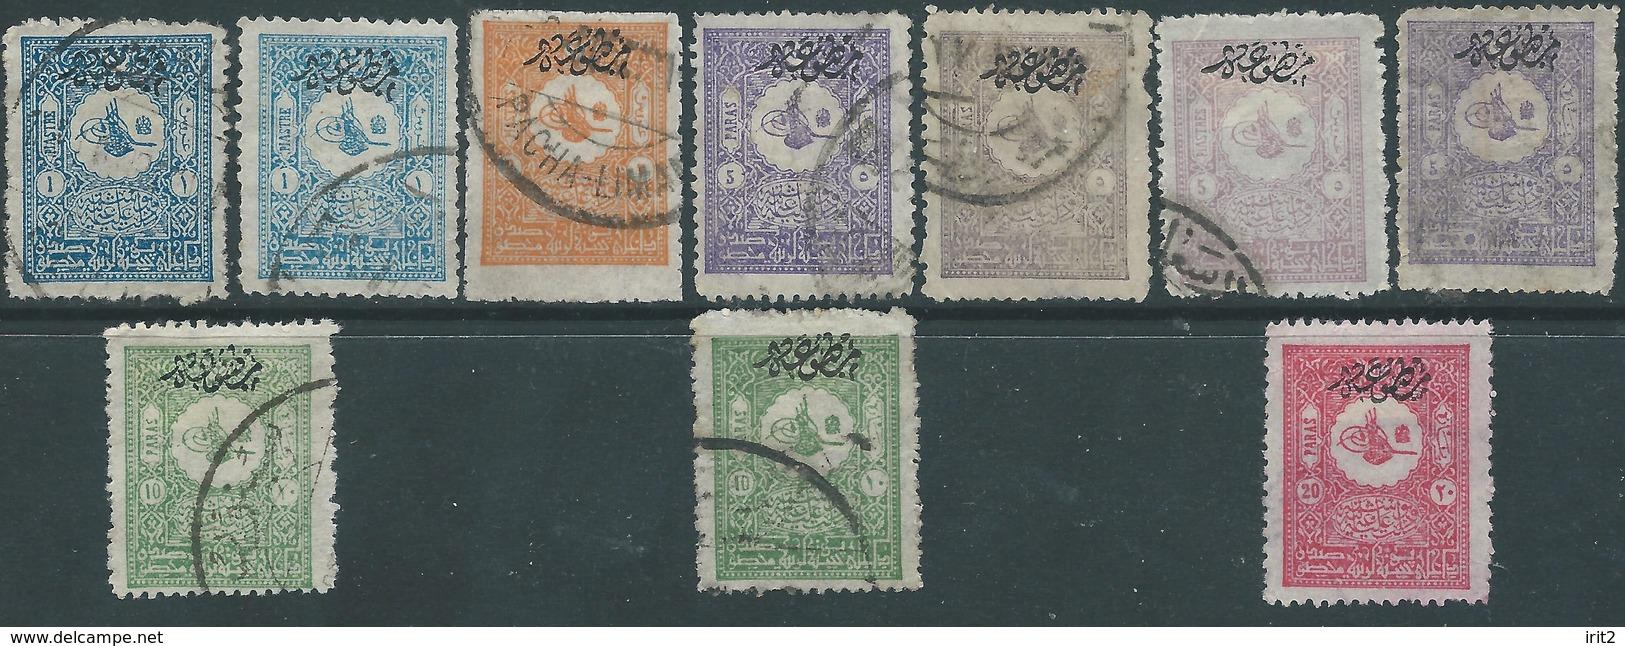 Turchia Turkey Ottomano Ottoman 1901 -1905 Newspaper Stamps-Overprinted,complete Series,used,Value €55,00 - 1858-1921 Ottoman Empire